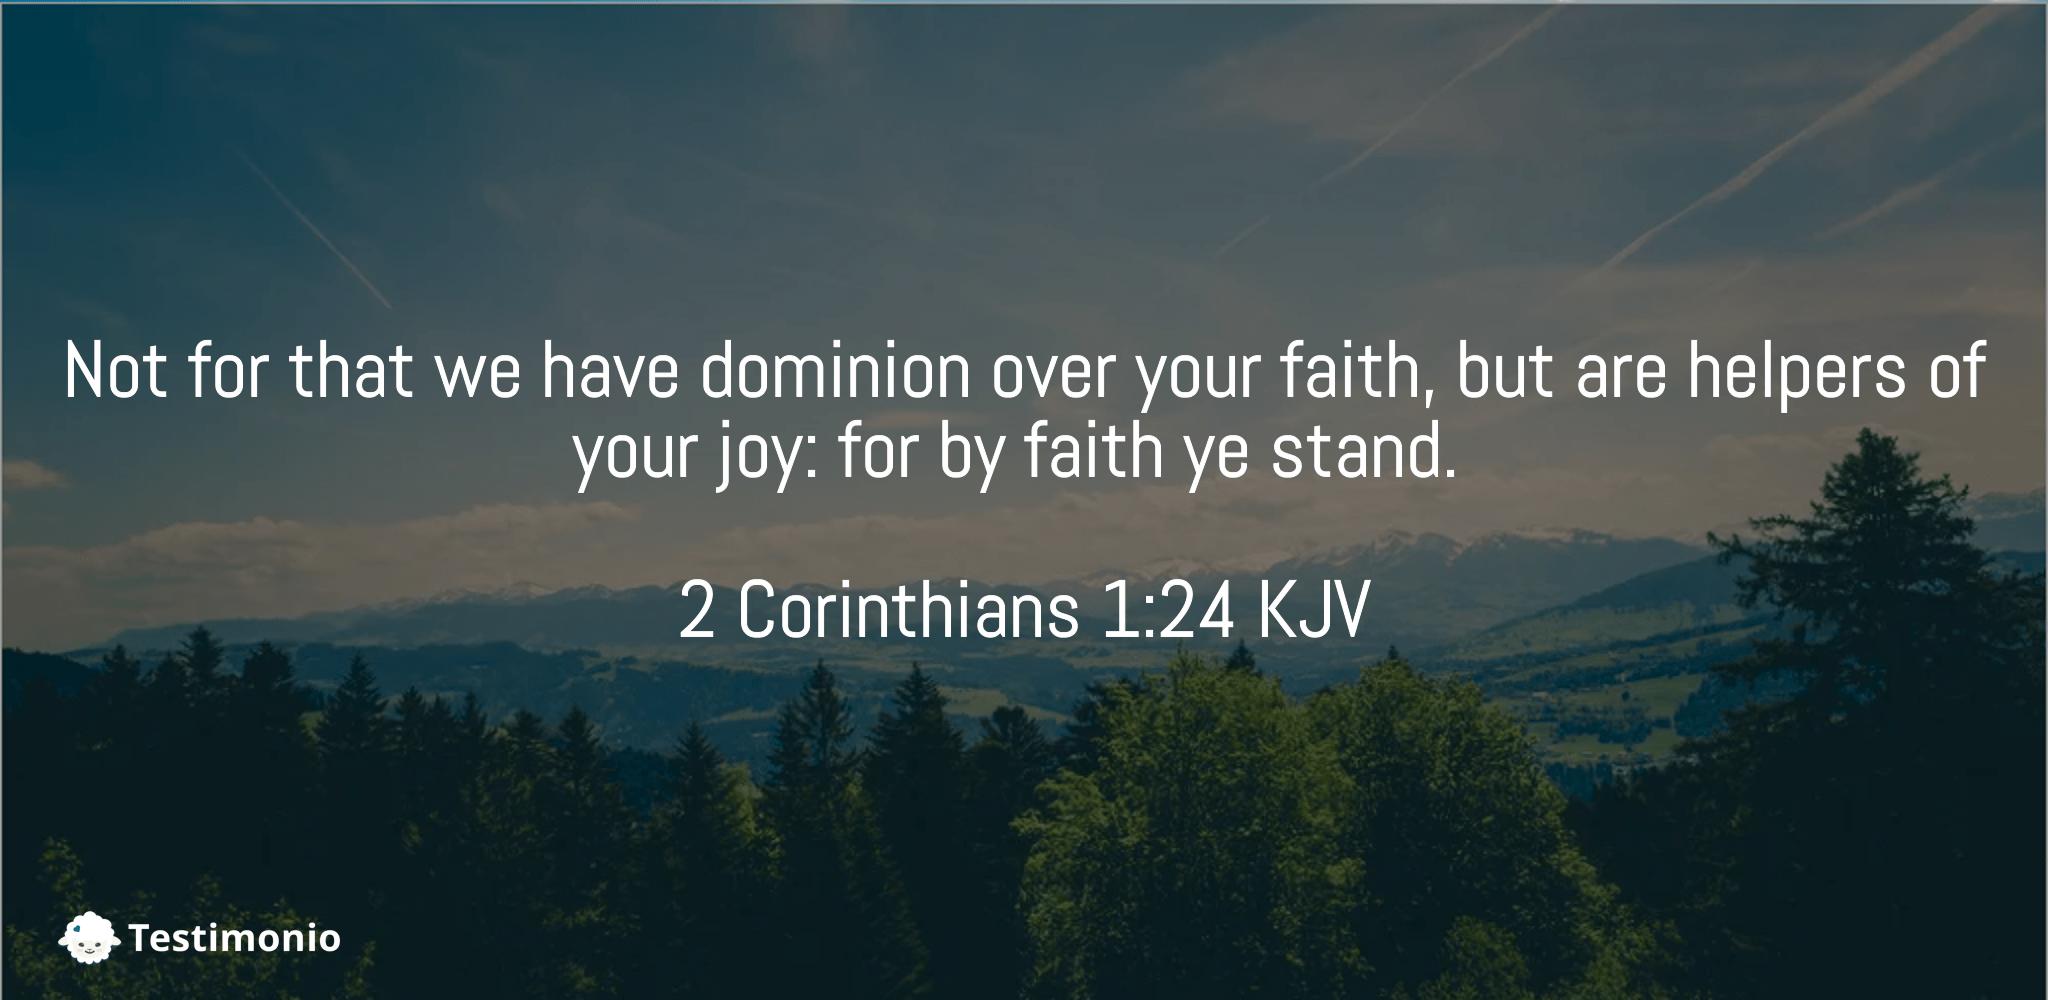 2 Corinthians 1:24